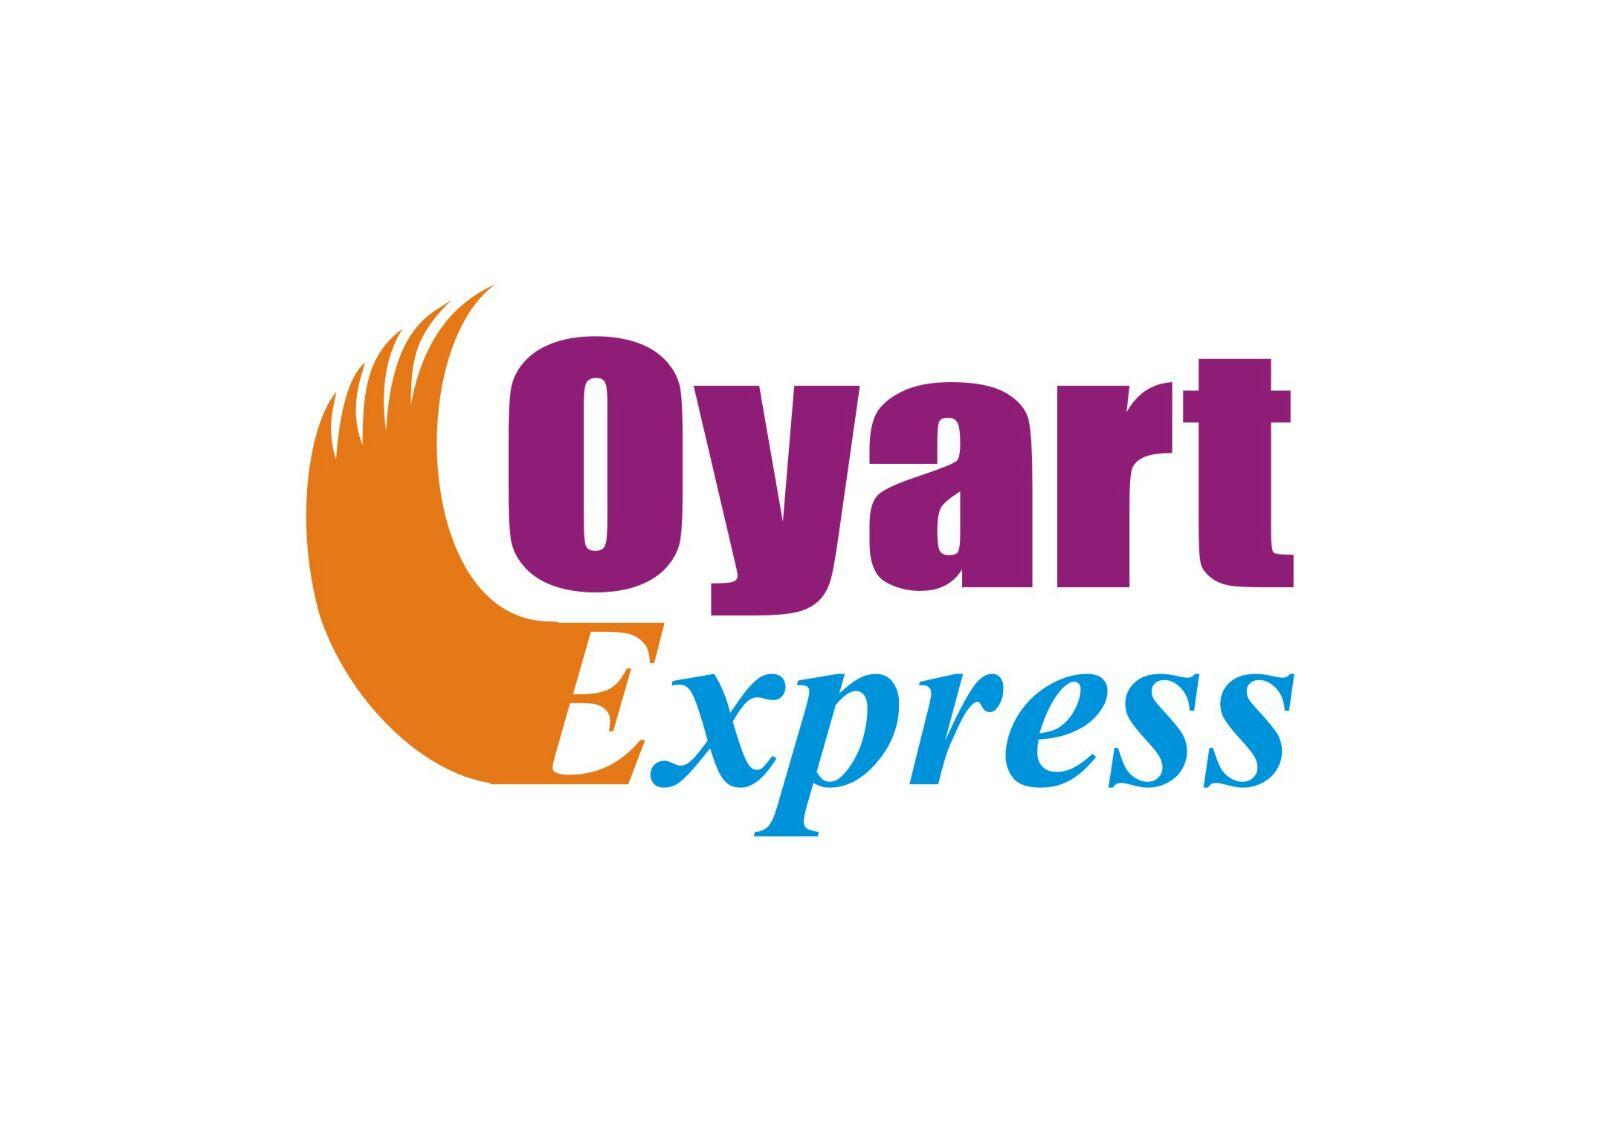 Oyart Express Services Limited